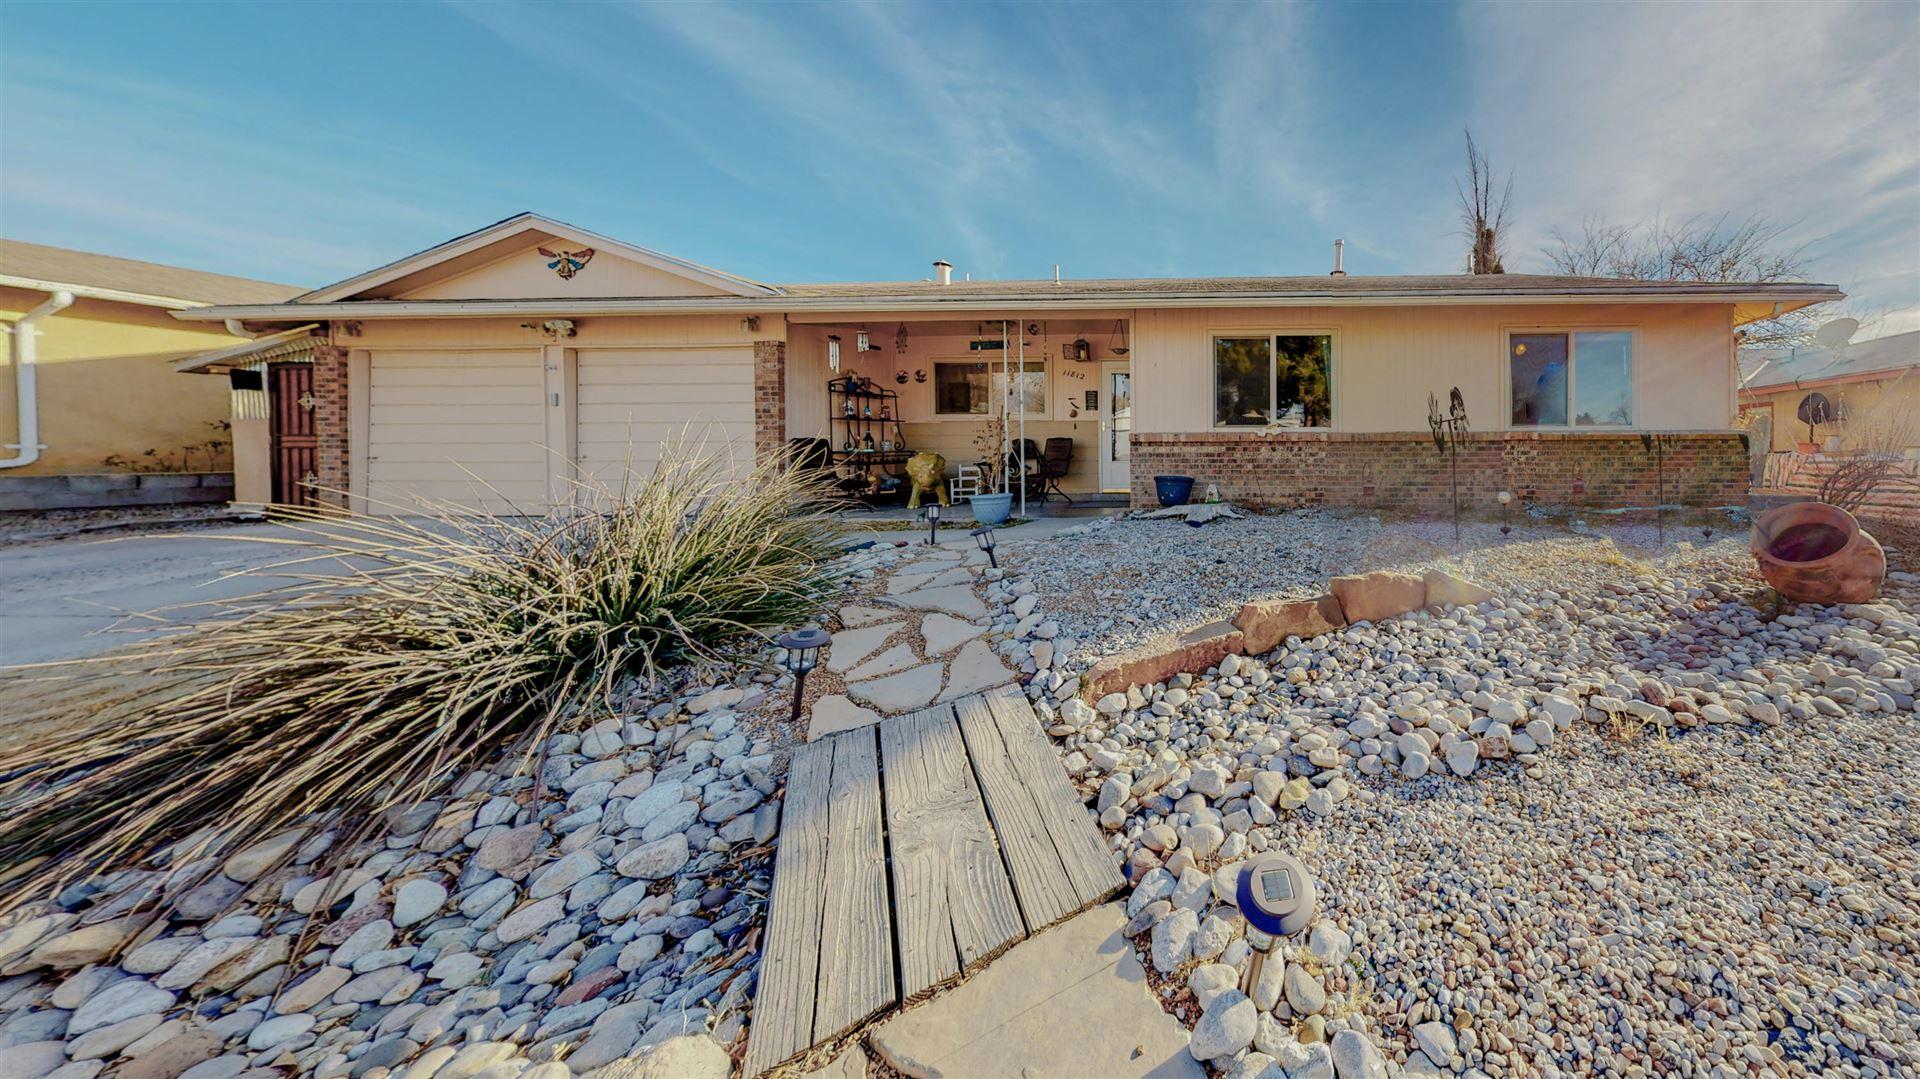 11812 PALO DURO Drive NE, Albuquerque, NM 87111 - MLS#: 985398